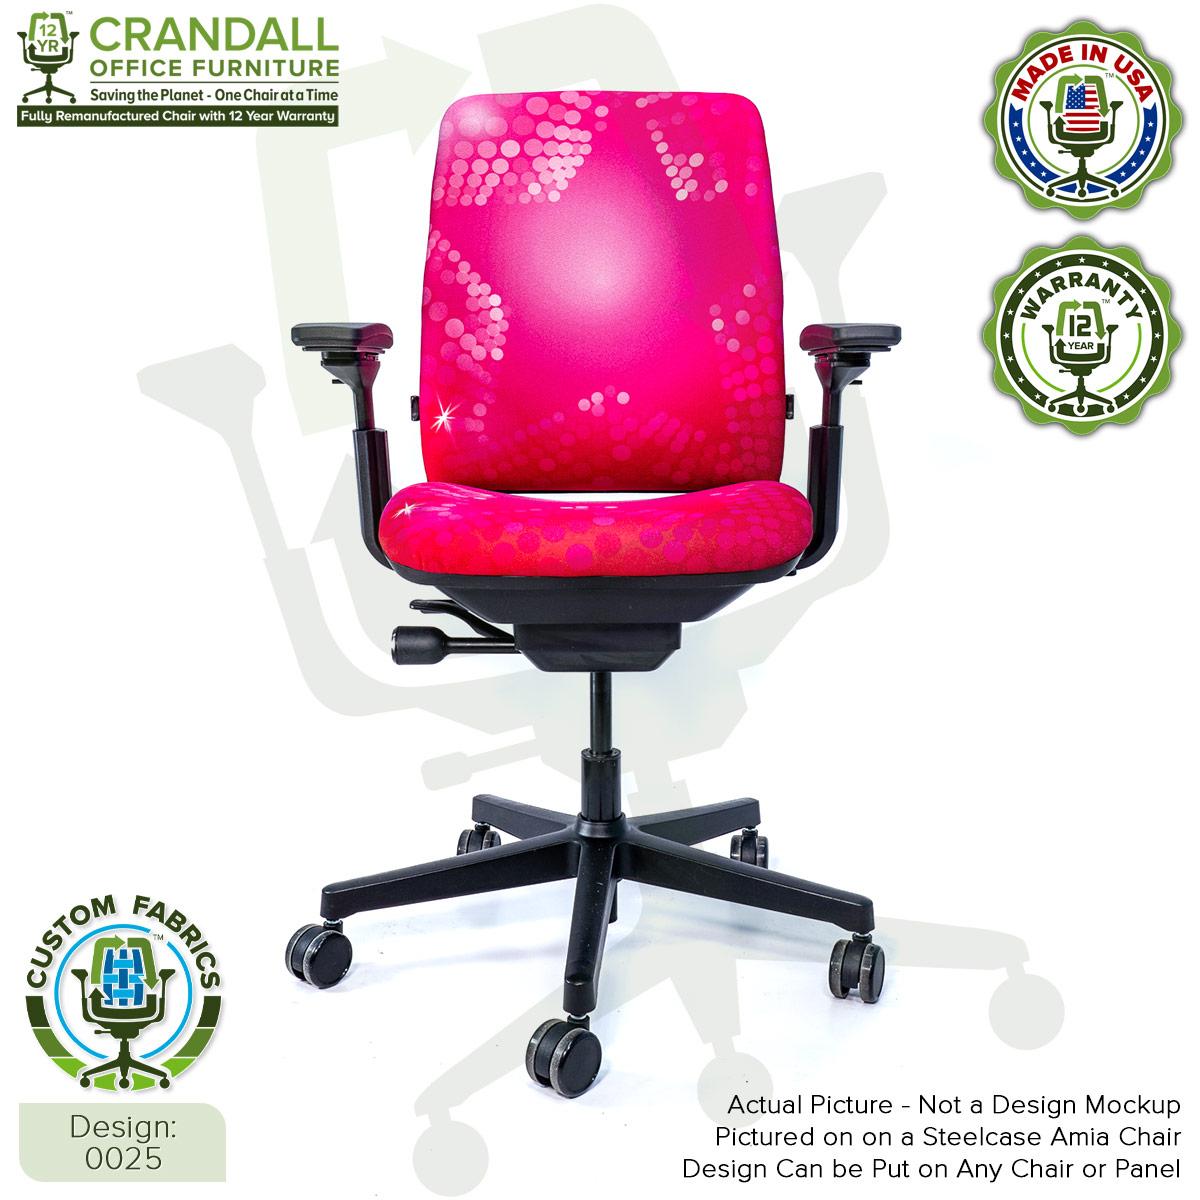 Custom Fabric Remanufactured Steelcase Amia Chair - Design 0025